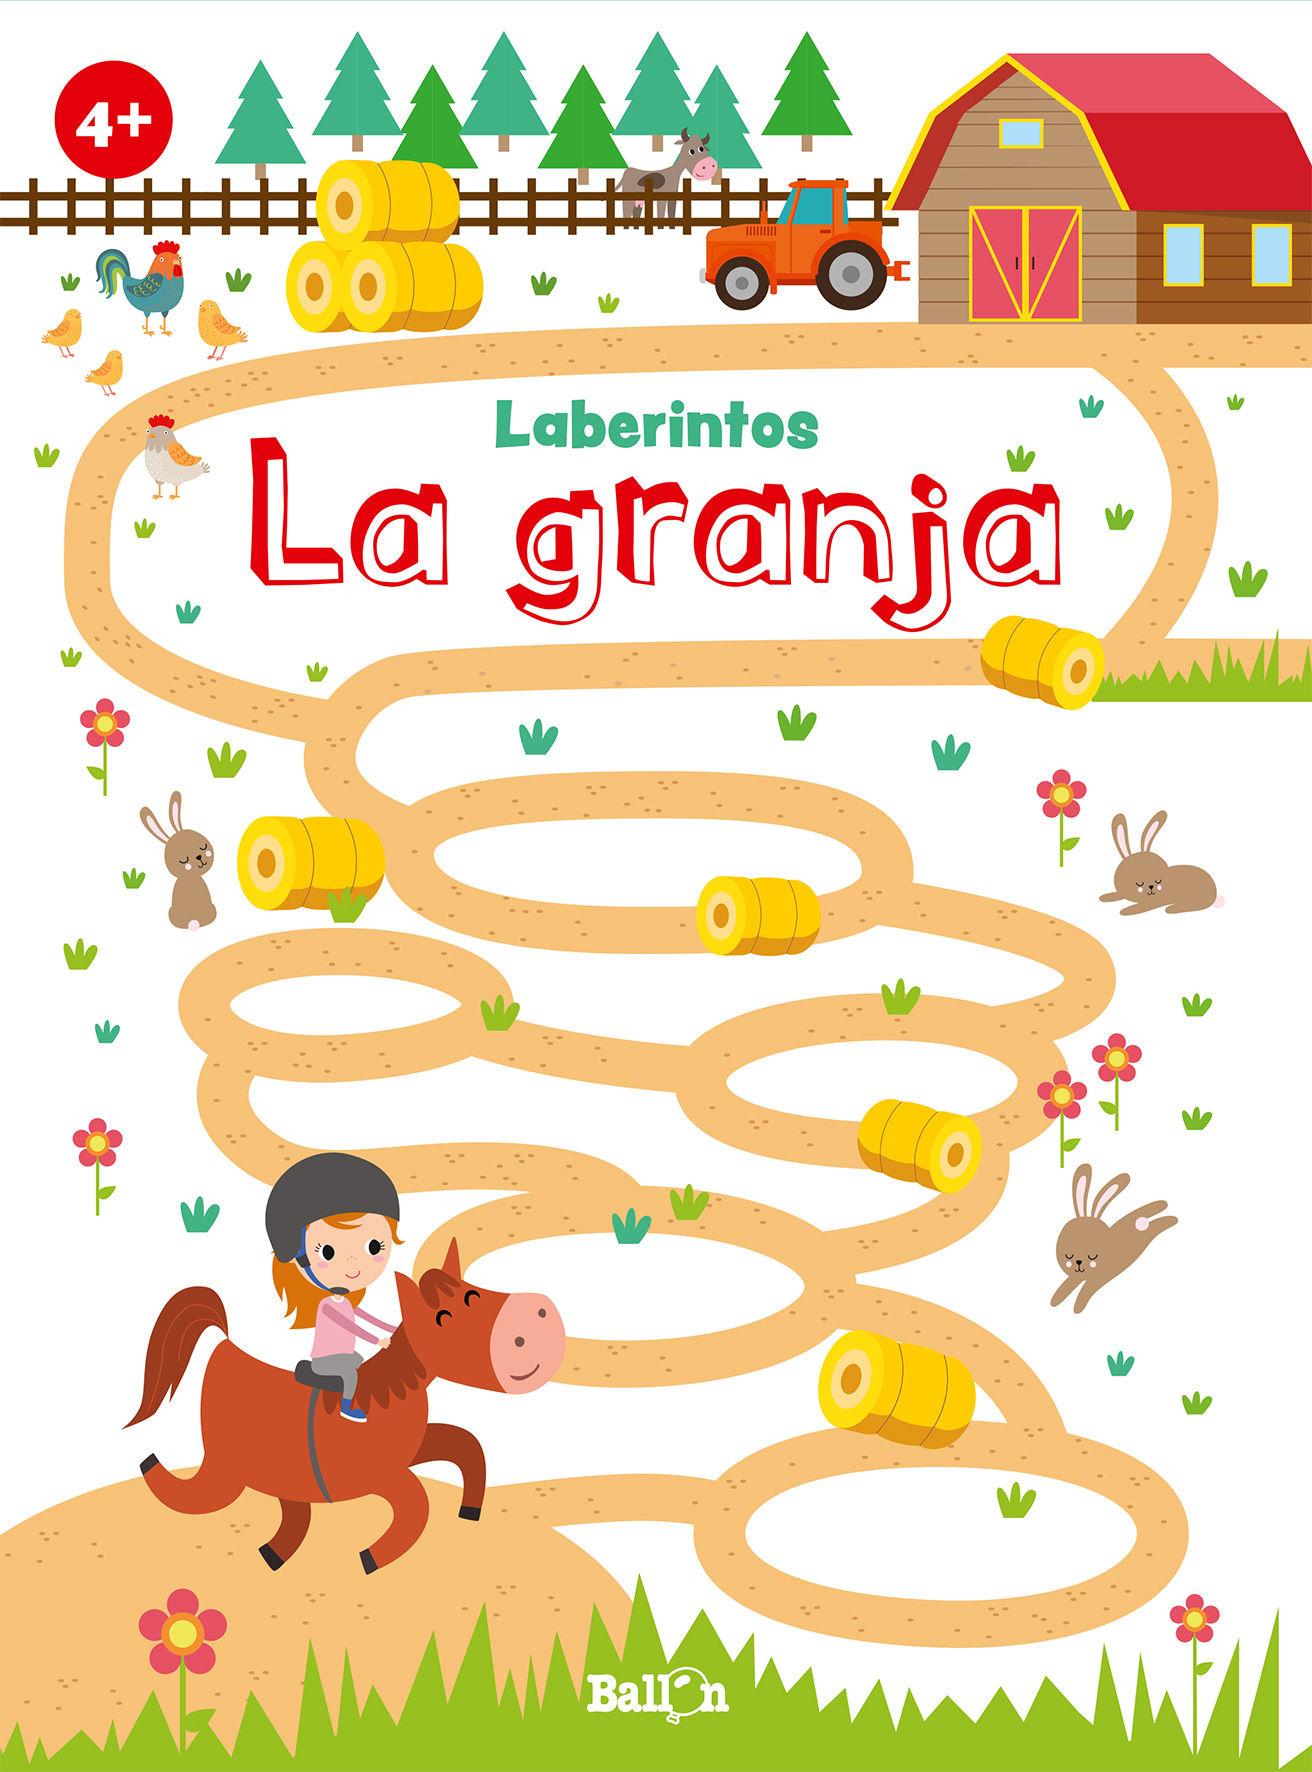 LABERINTOS LA GRANJA